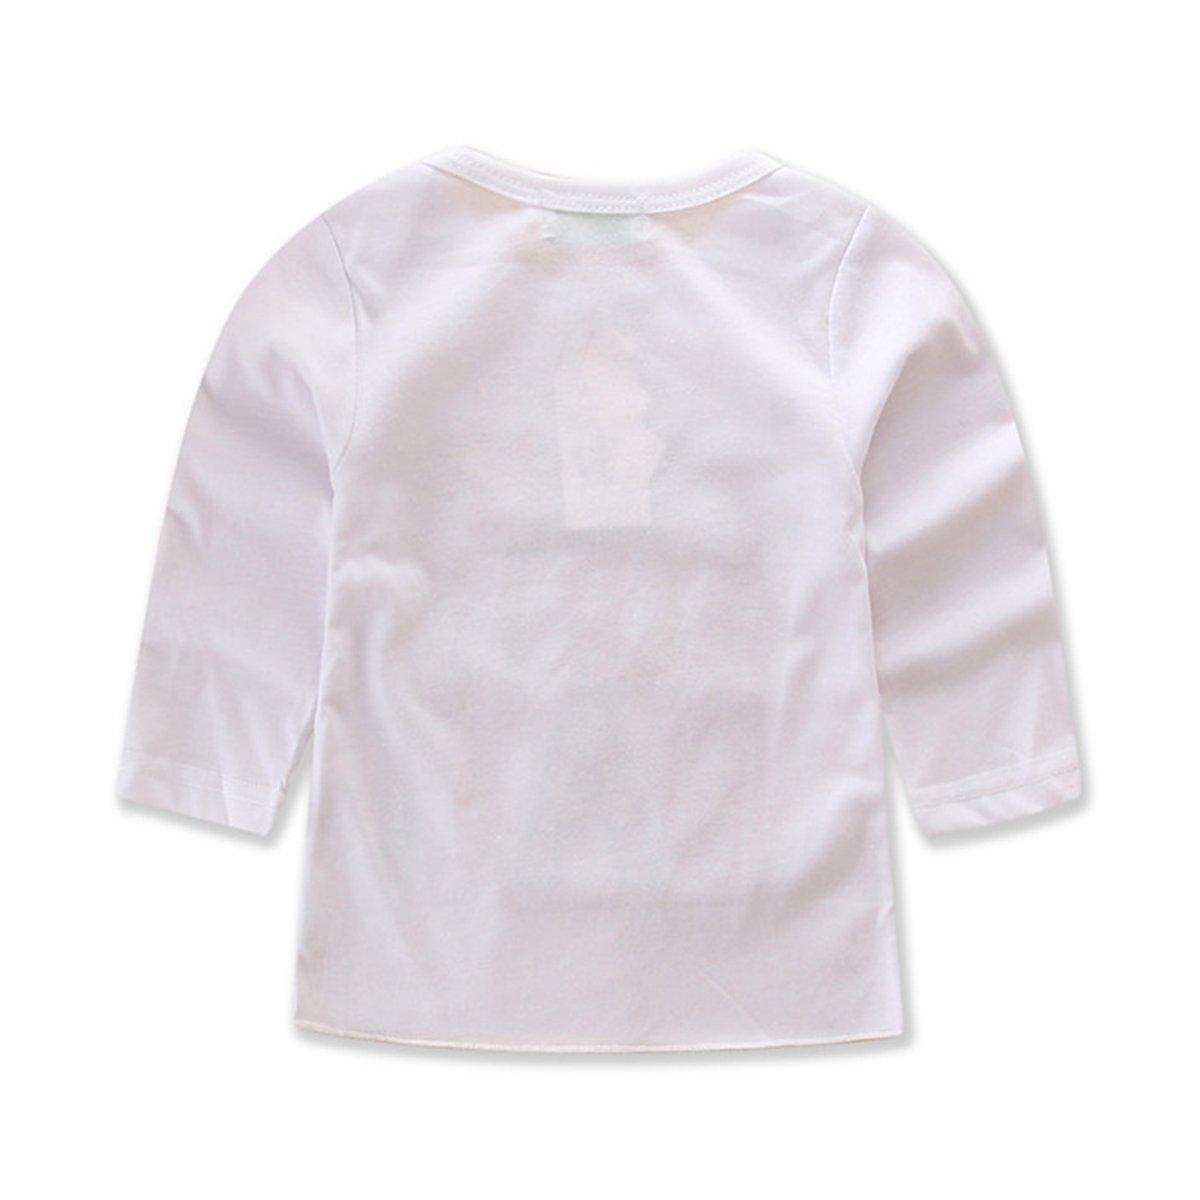 Amazon 1 6T Toddler Baby Girls Birthday Outfit Set Shirt Rainbow Tutu Skirt Clothing